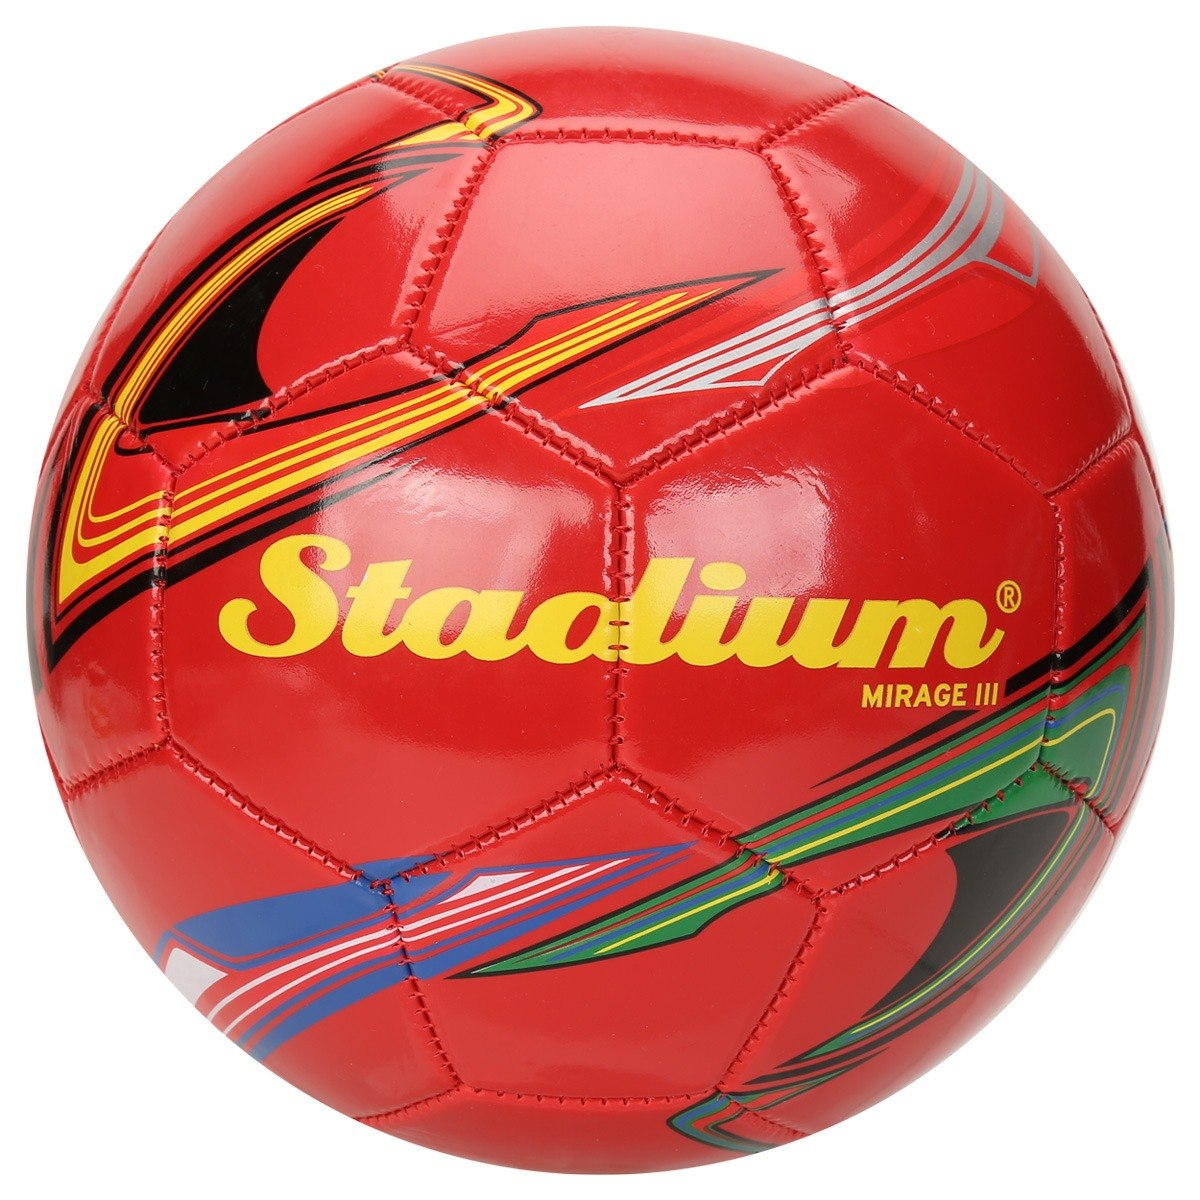 073a8f7bb8 bola de futebol de campo stadium mirage iii. Carregando zoom.